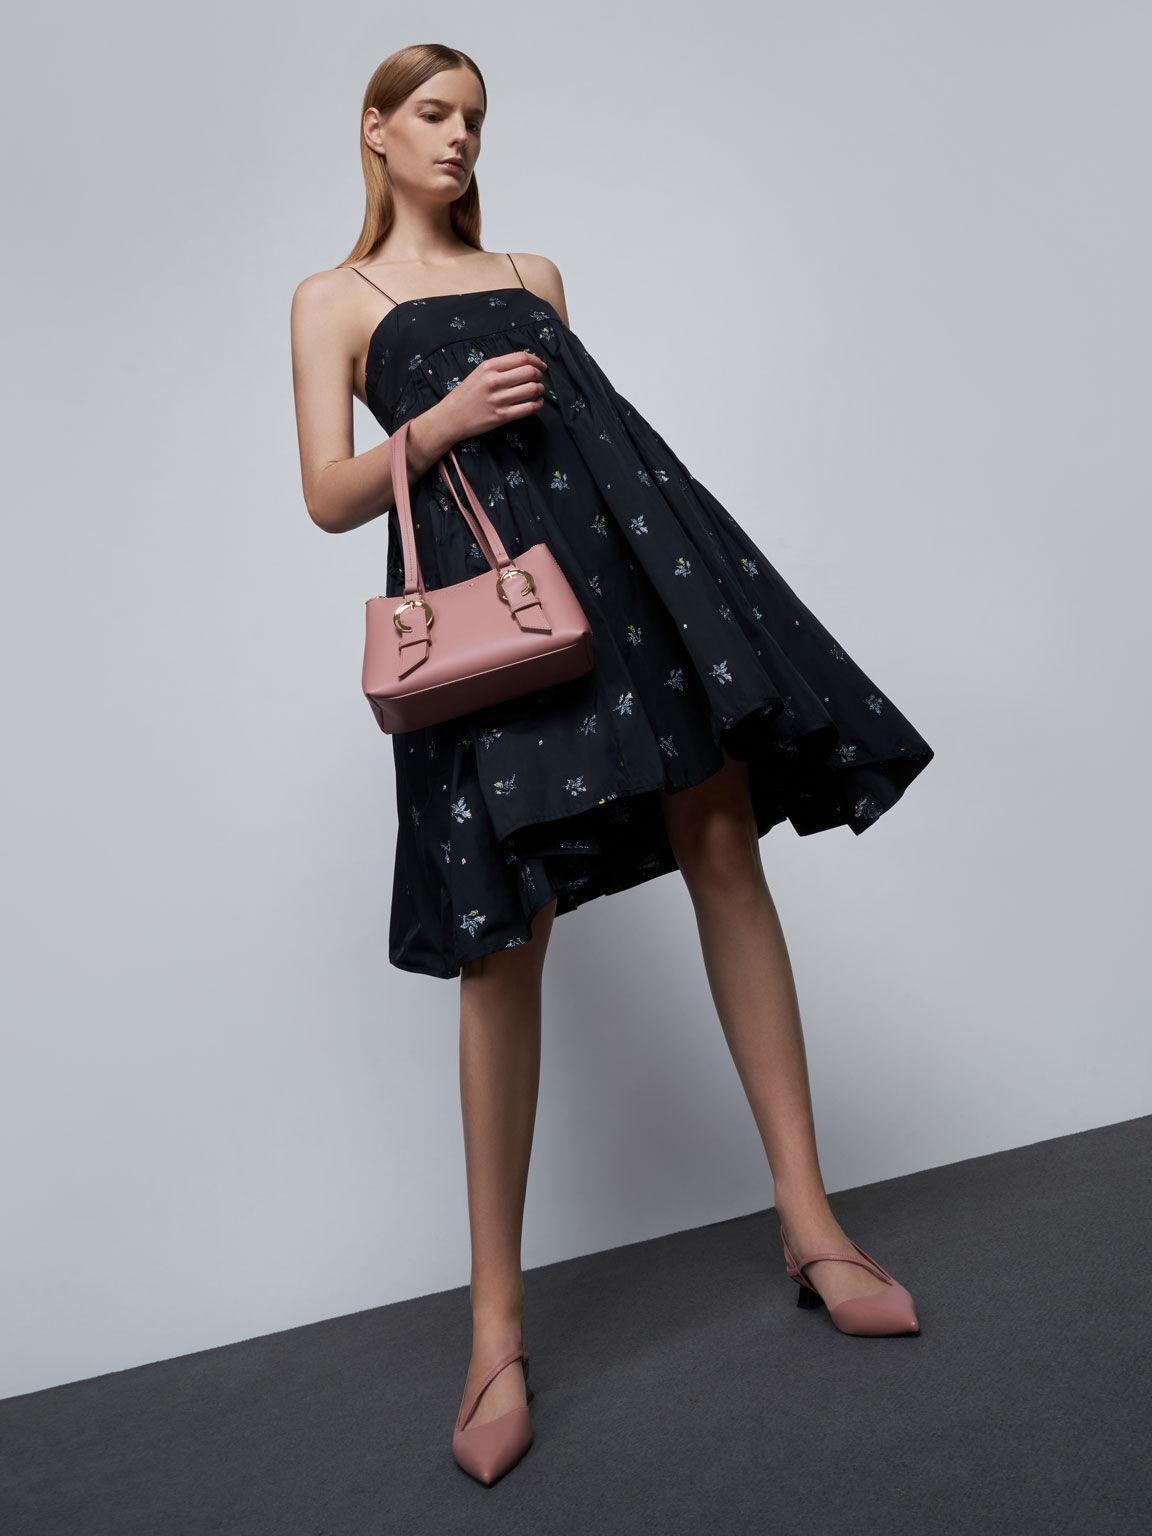 Leather Asymmetric Slingback Pumps, Pink, hi-res